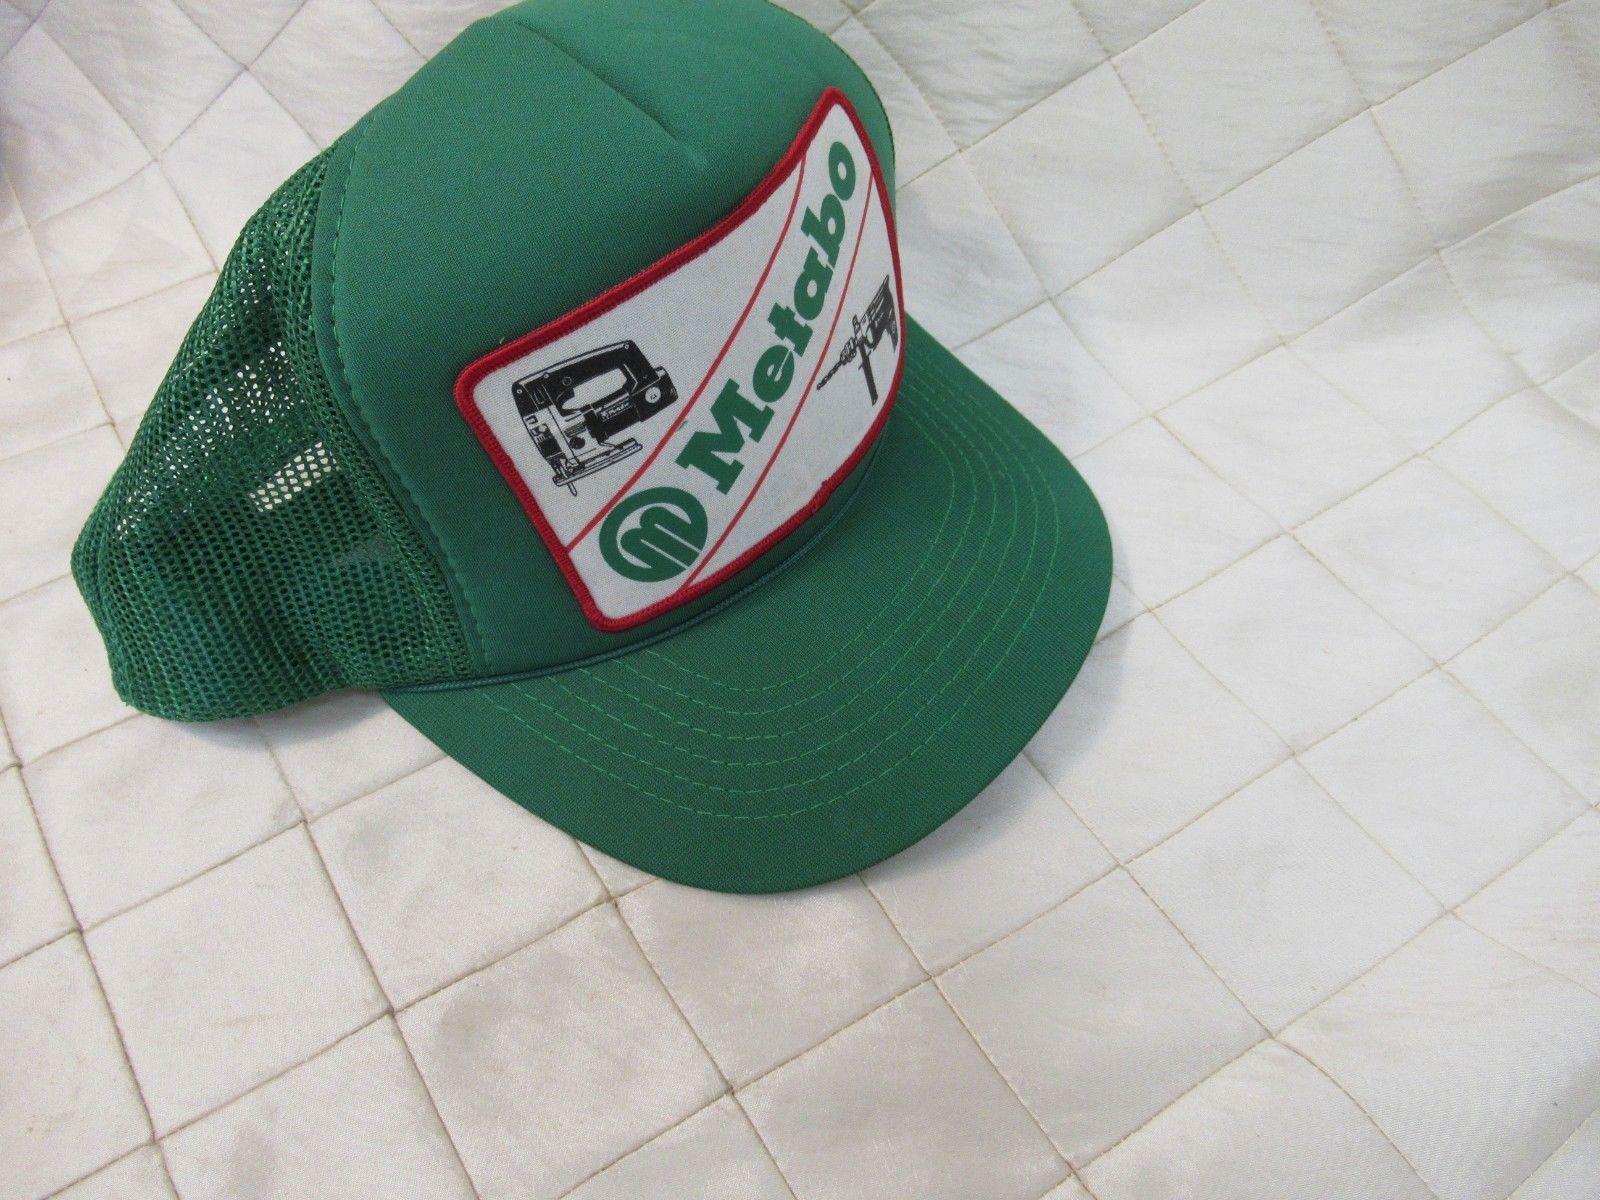 e776d97adf8 Vintage Metabo Power Tools Trucker Hat Snapback Cap Green NOS